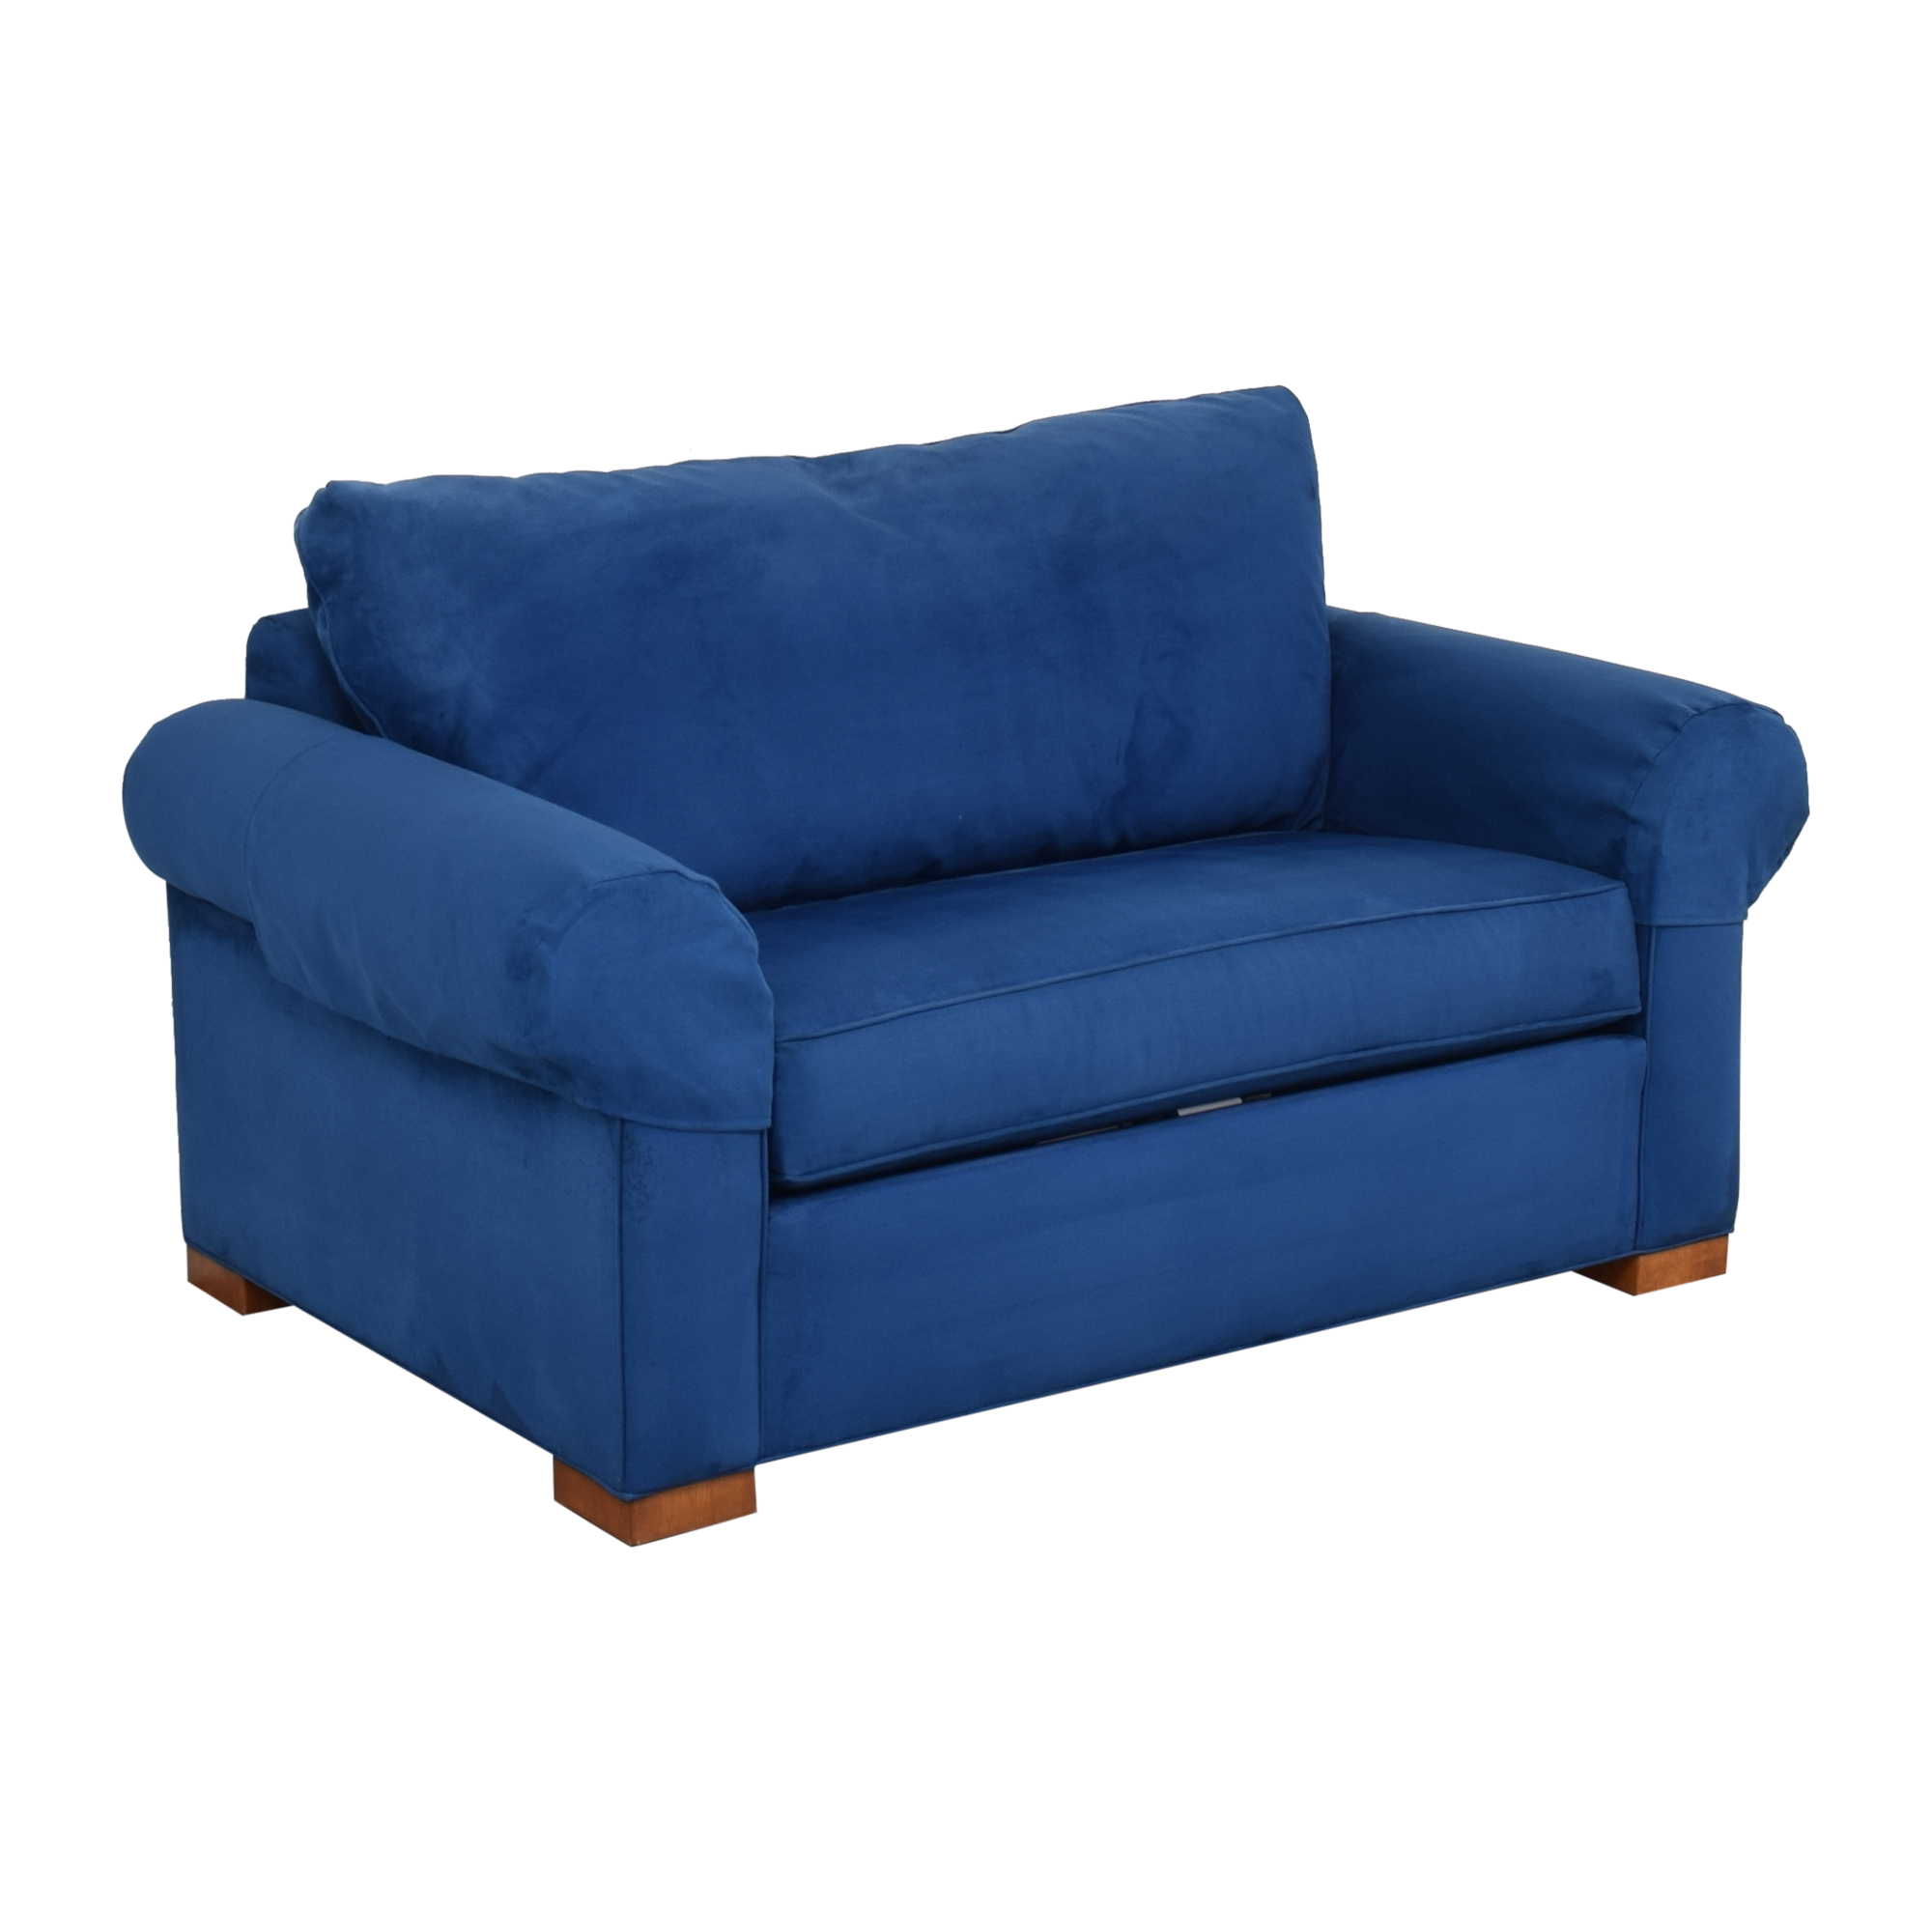 shop Ethan Allen Twin Sleeper Marina Chair with Ottoman Ethan Allen